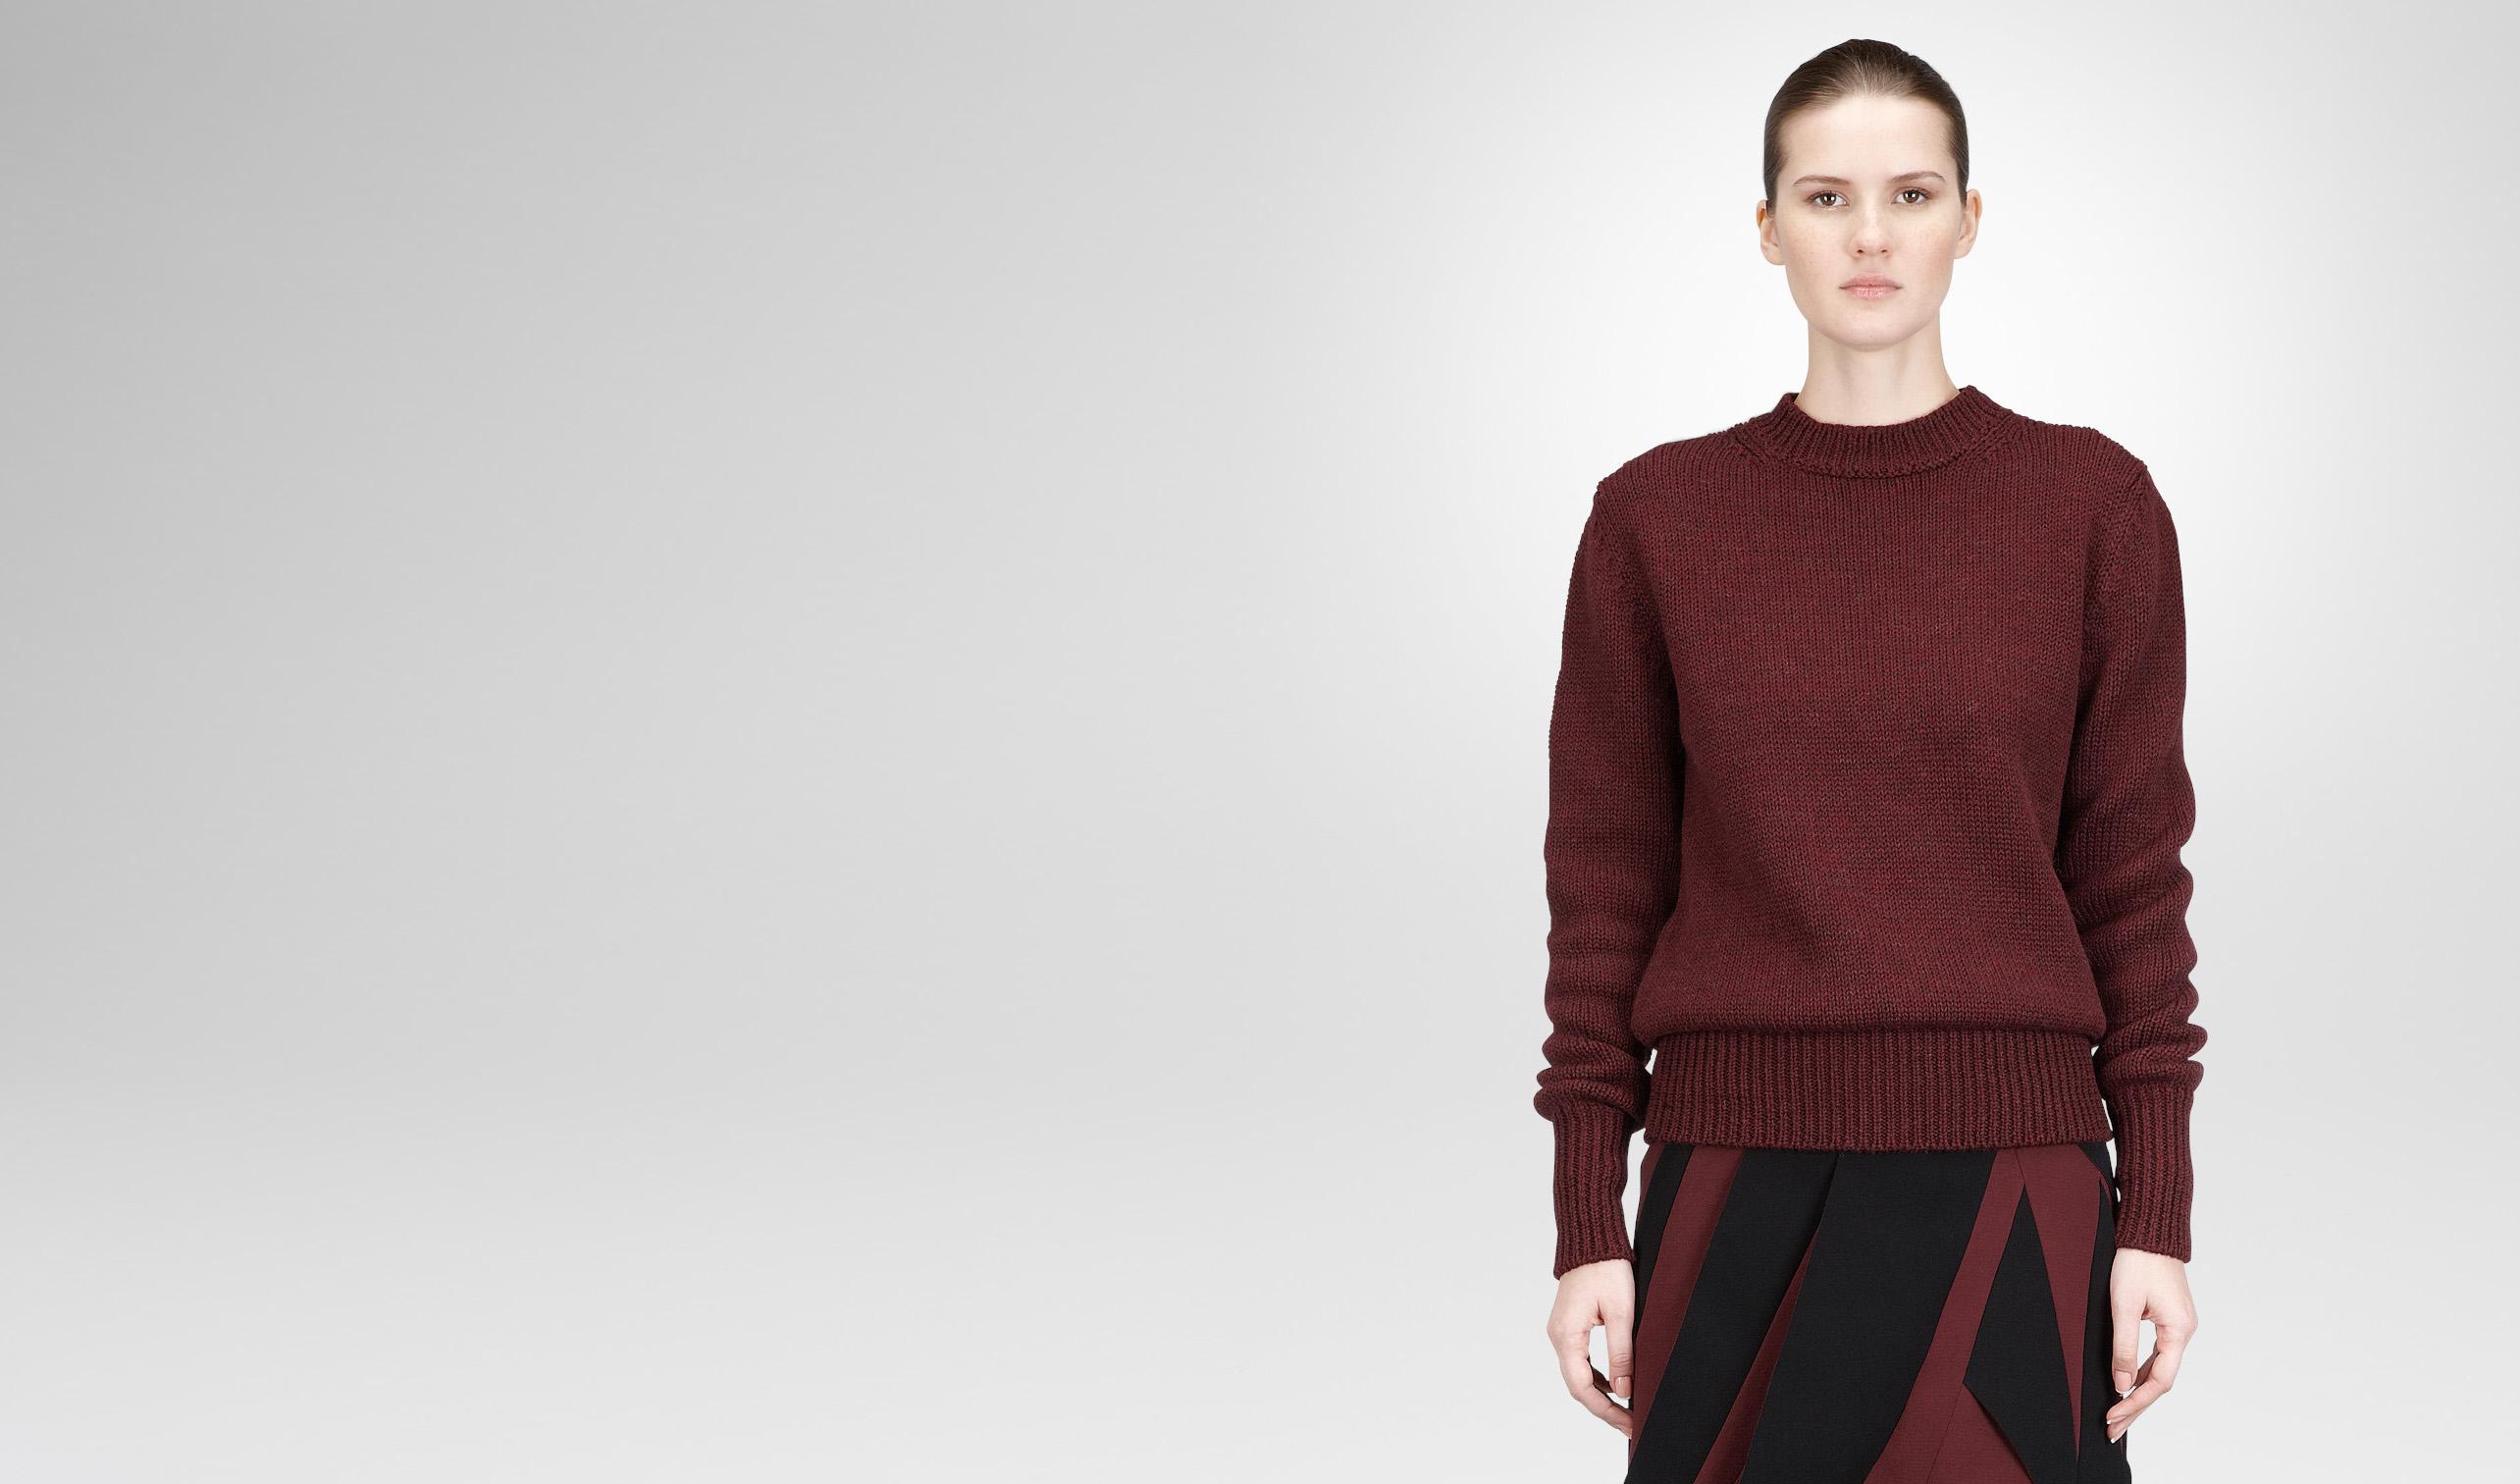 BOTTEGA VENETA Knitwear or Top or Shirt D AUBERGINE DRY WOOL SWEATER pl